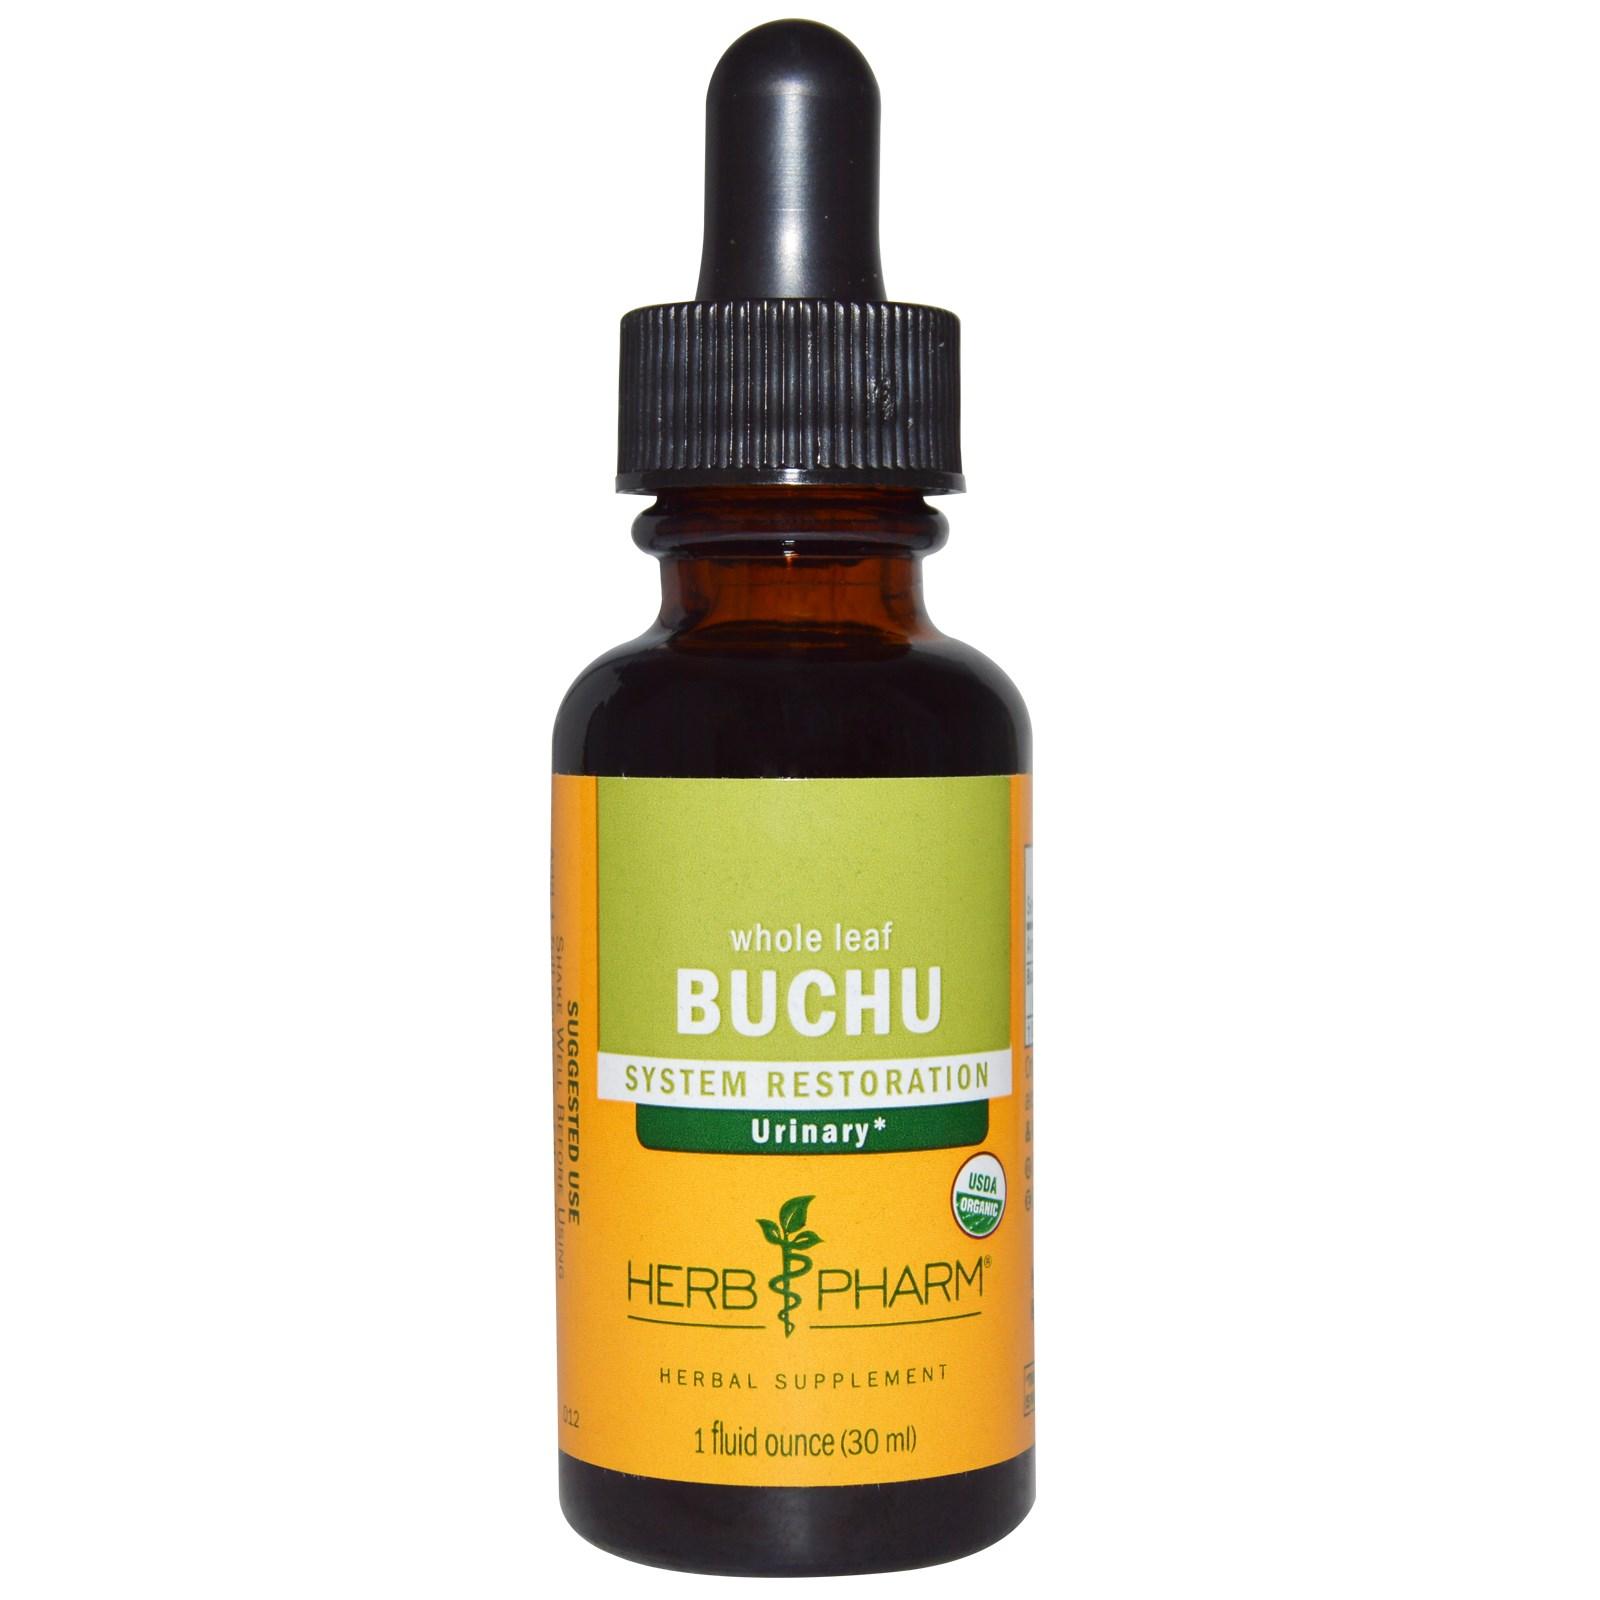 Herb Pharm, Бучу, цельный лист, 1 жидкая унция (30 мл)